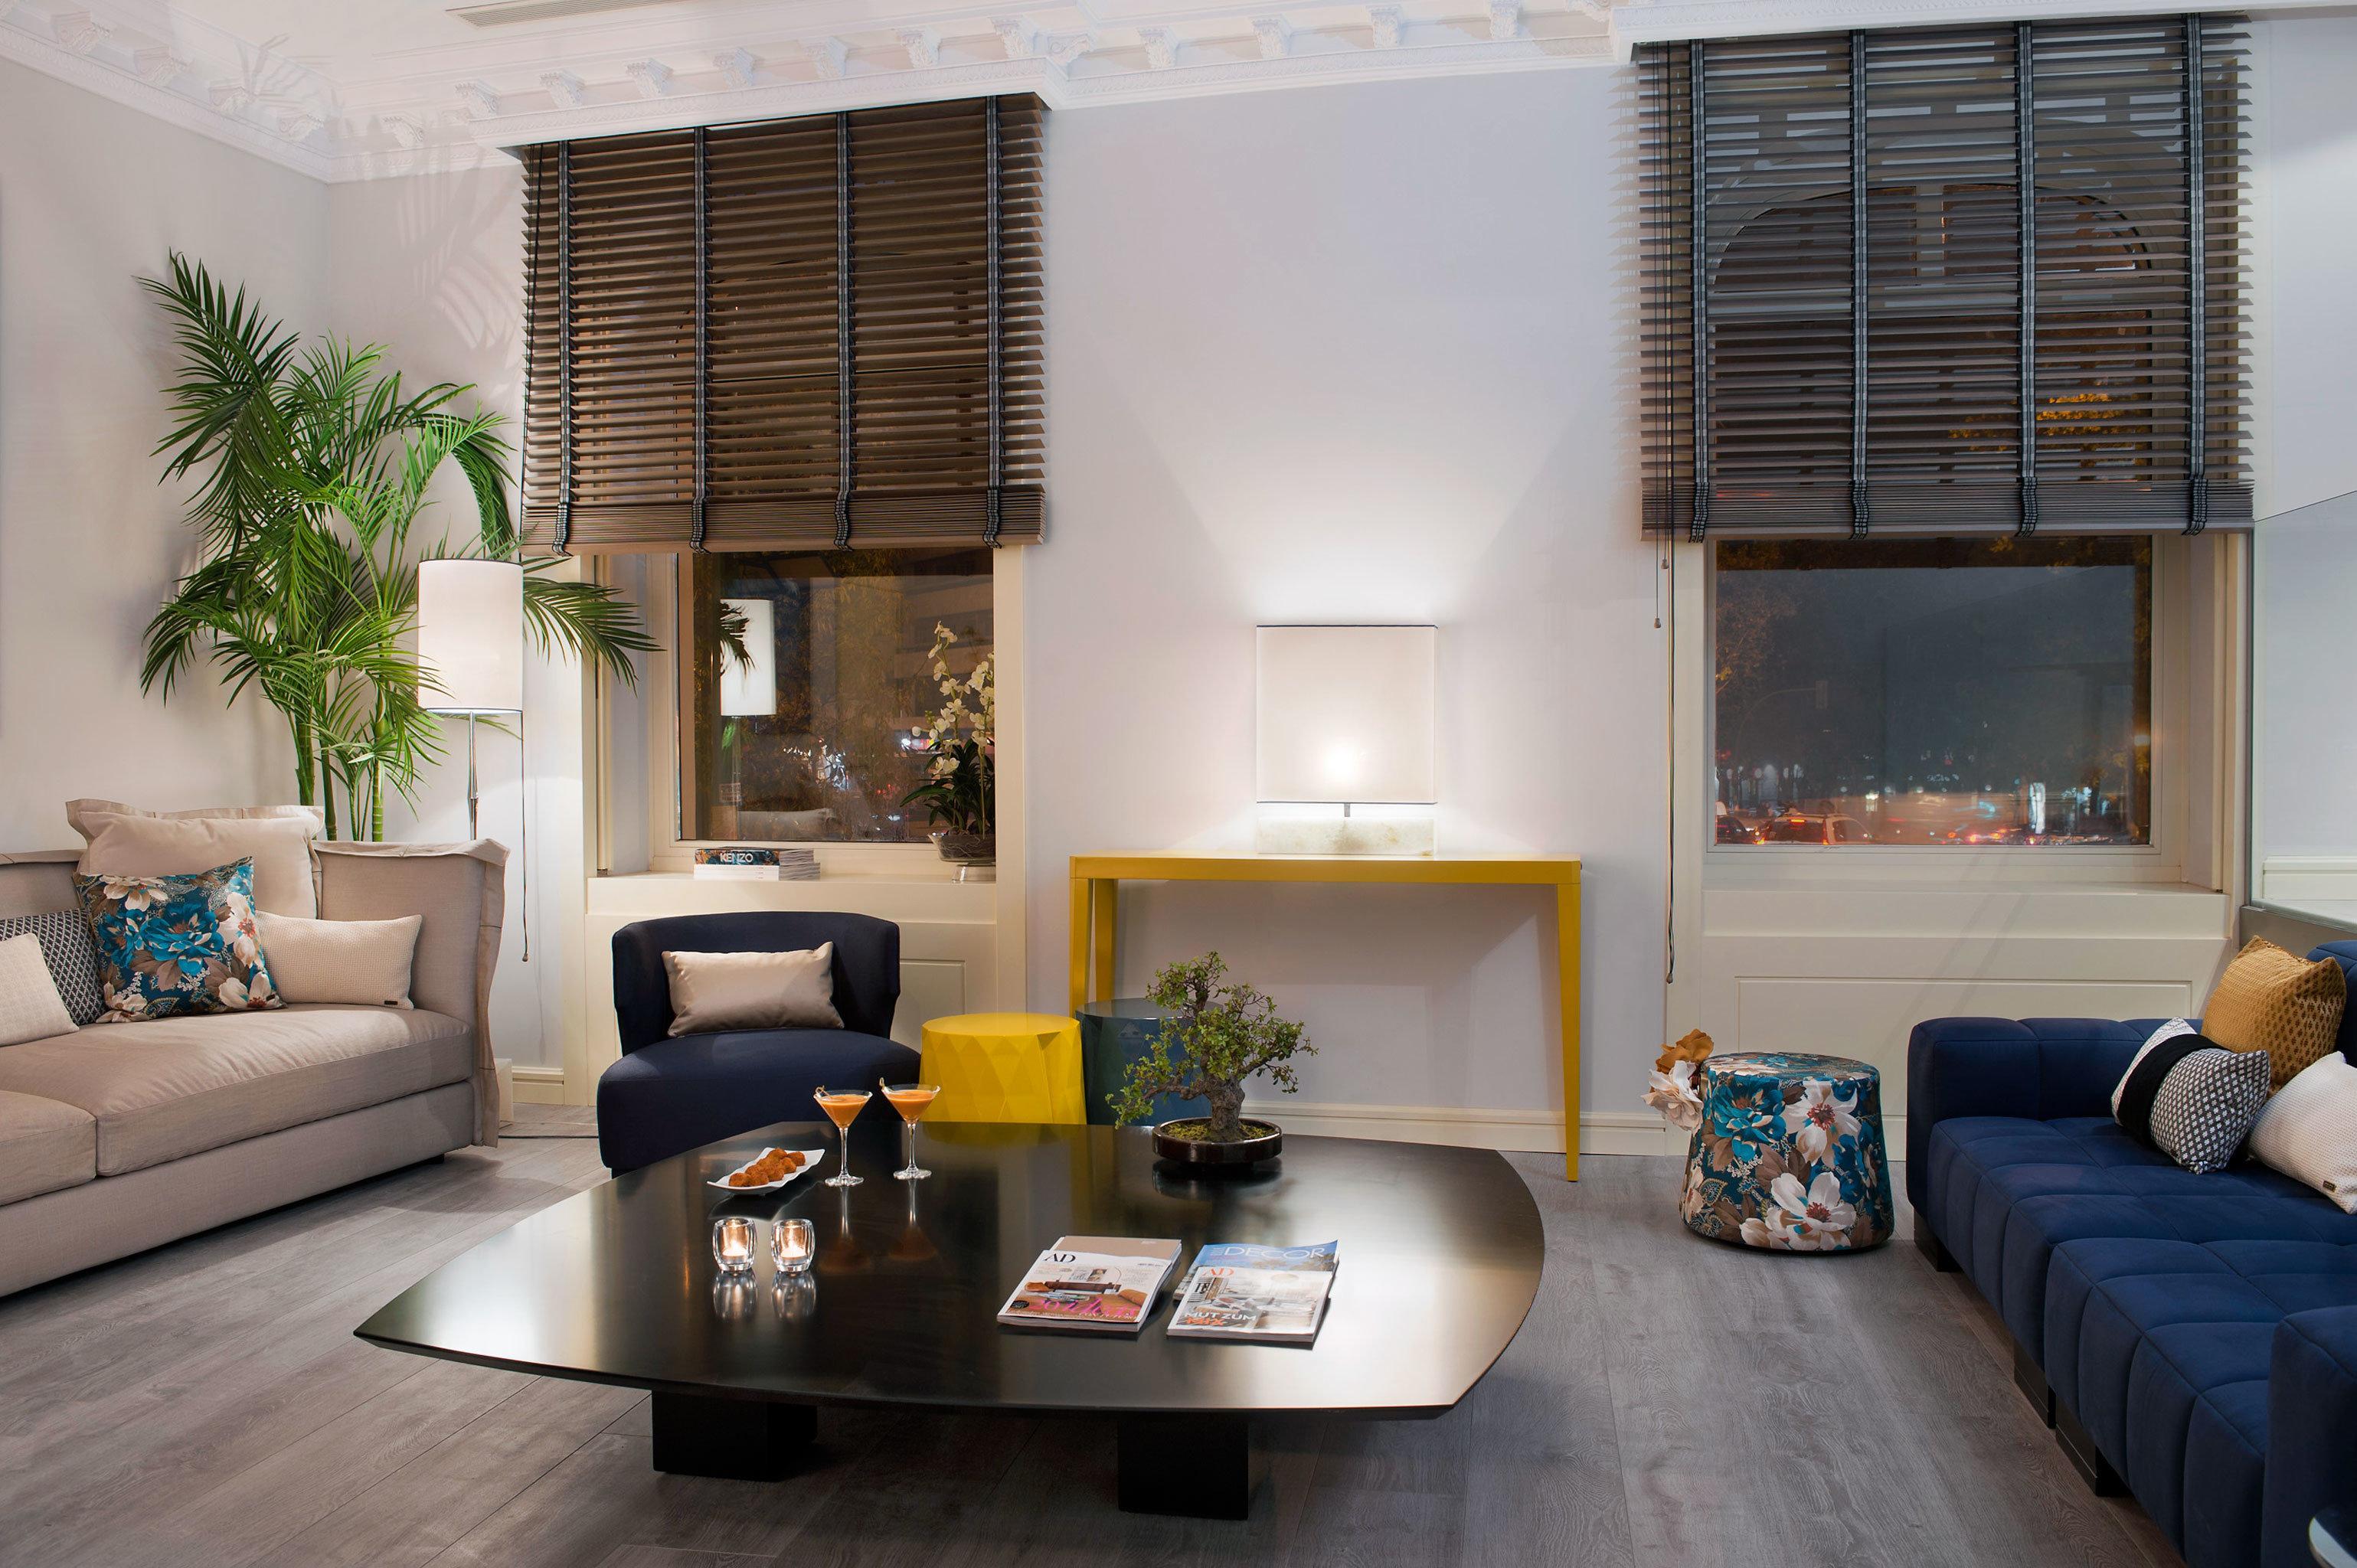 Boutique City Hip Modern Suite sofa living room property condominium home house loft